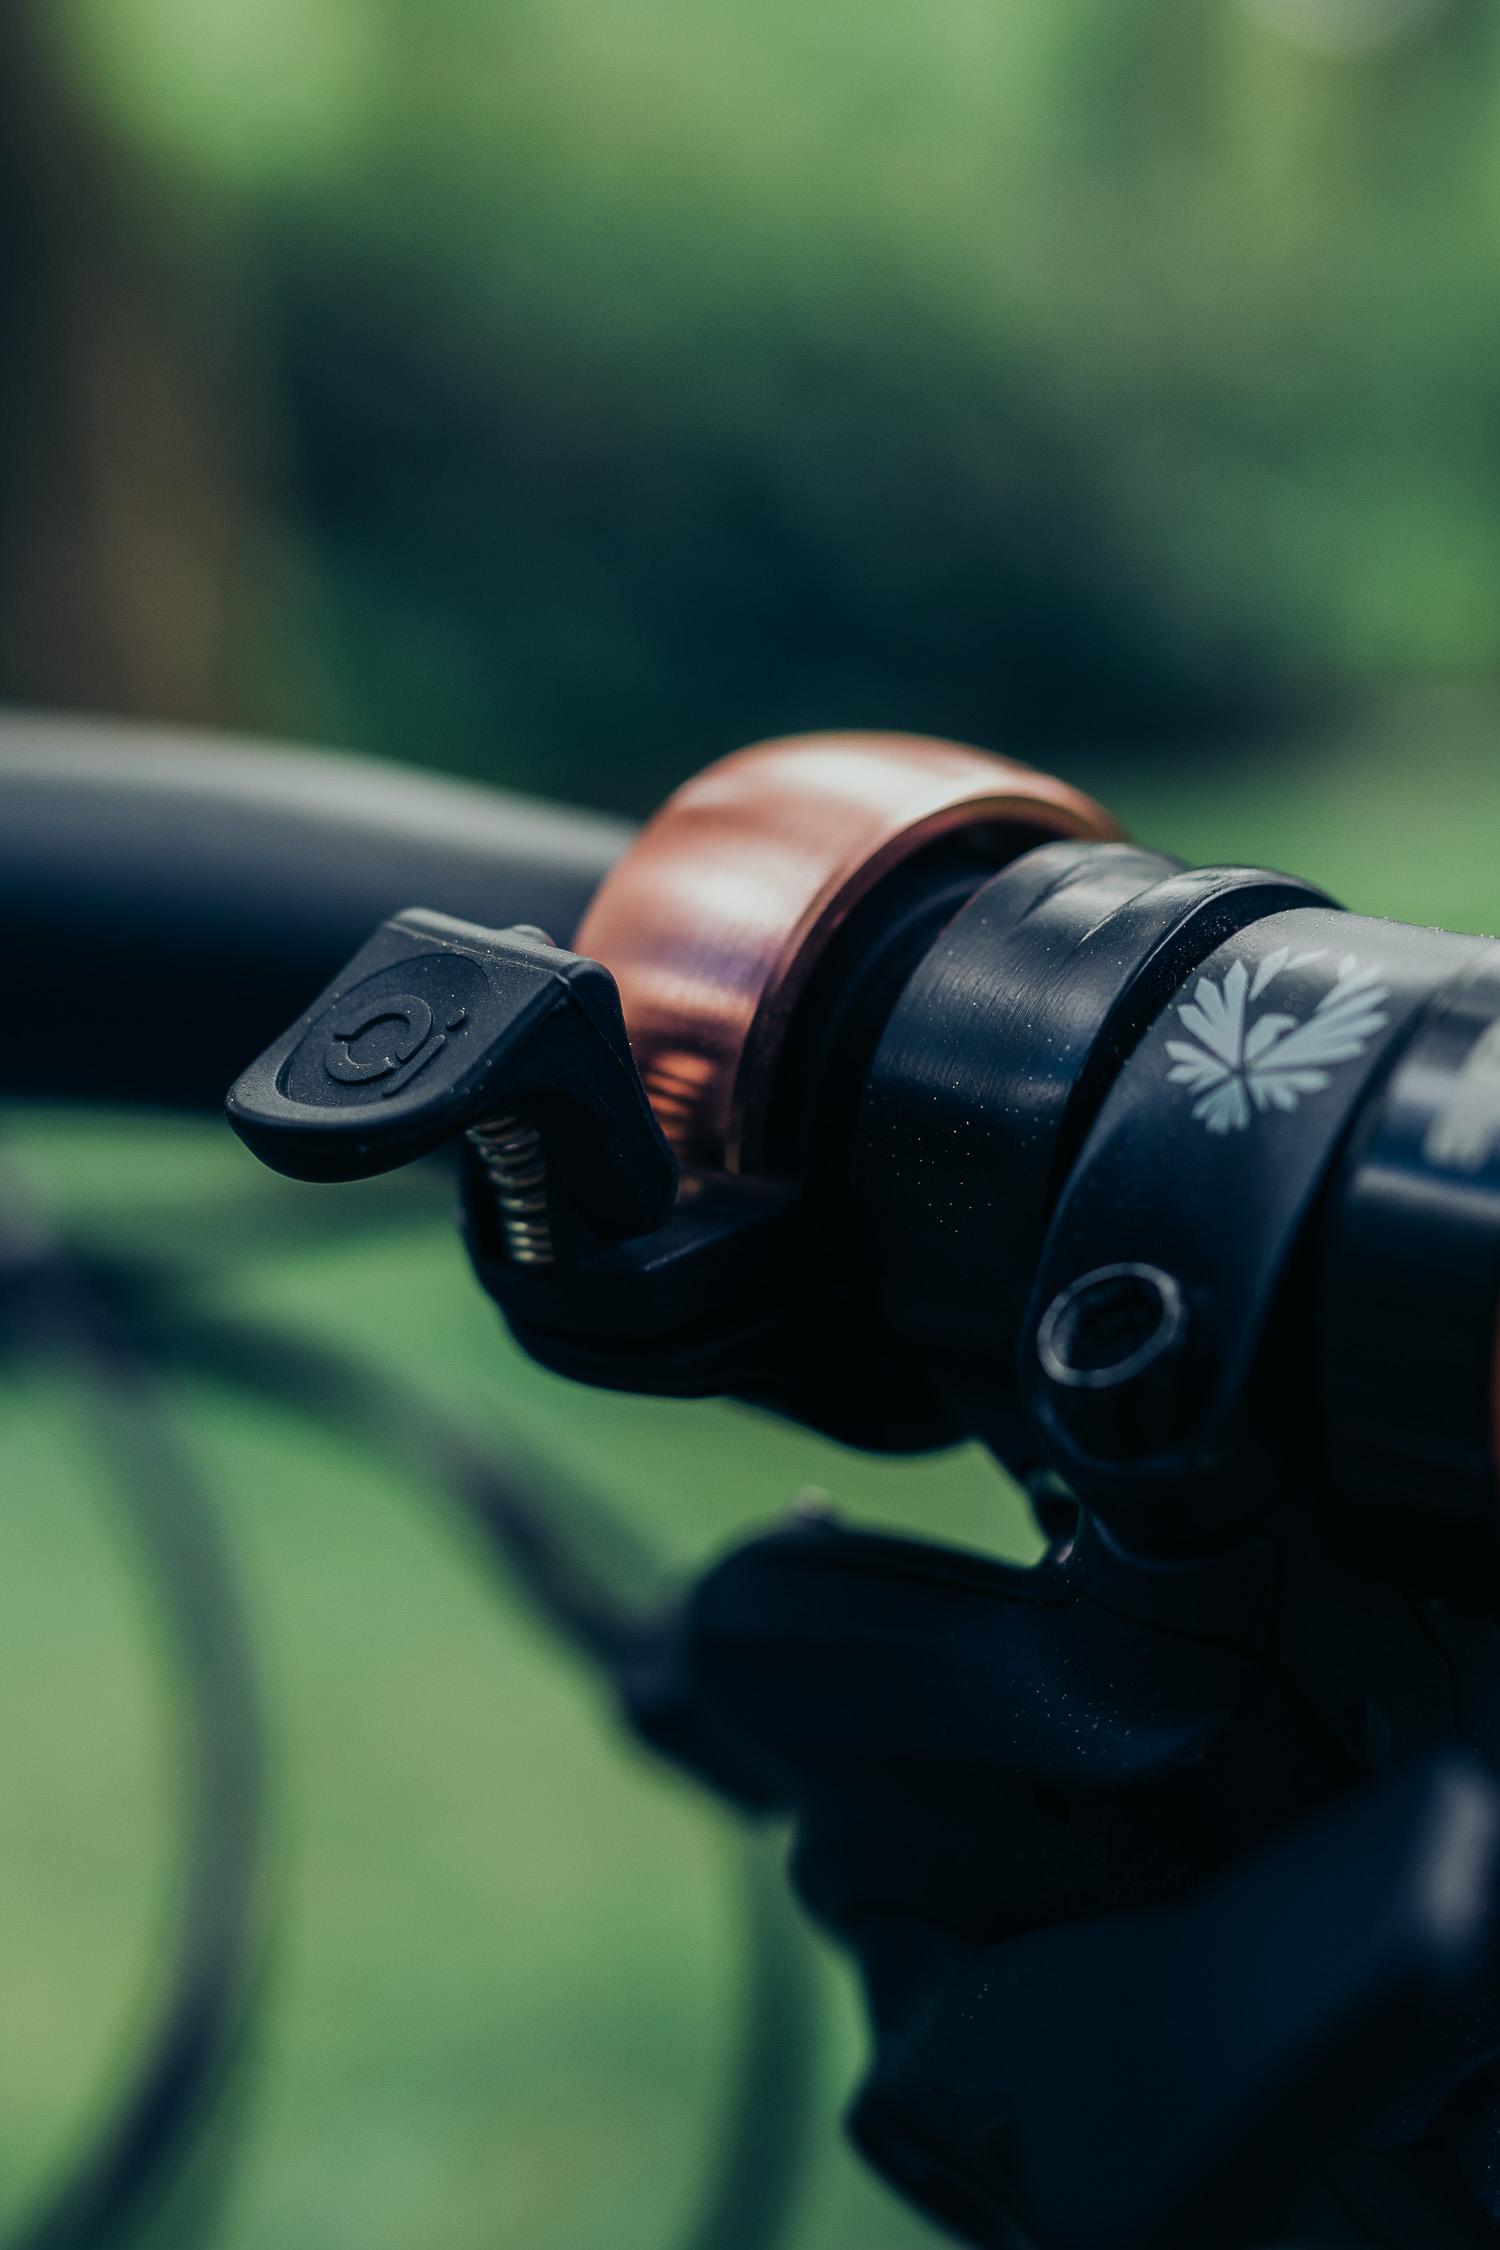 OI bike bell